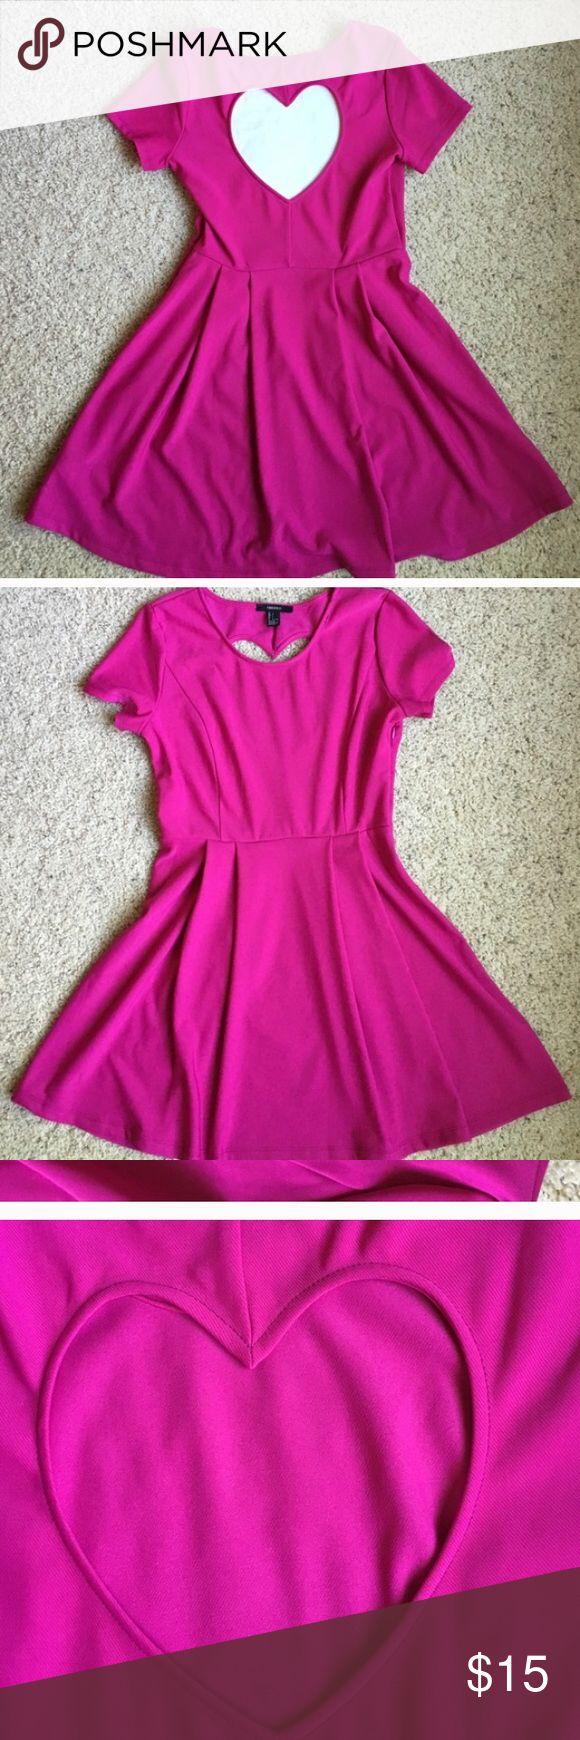 Forever 21 hot pink heart back dress large Nwot skater dress Forever 21 Dresses